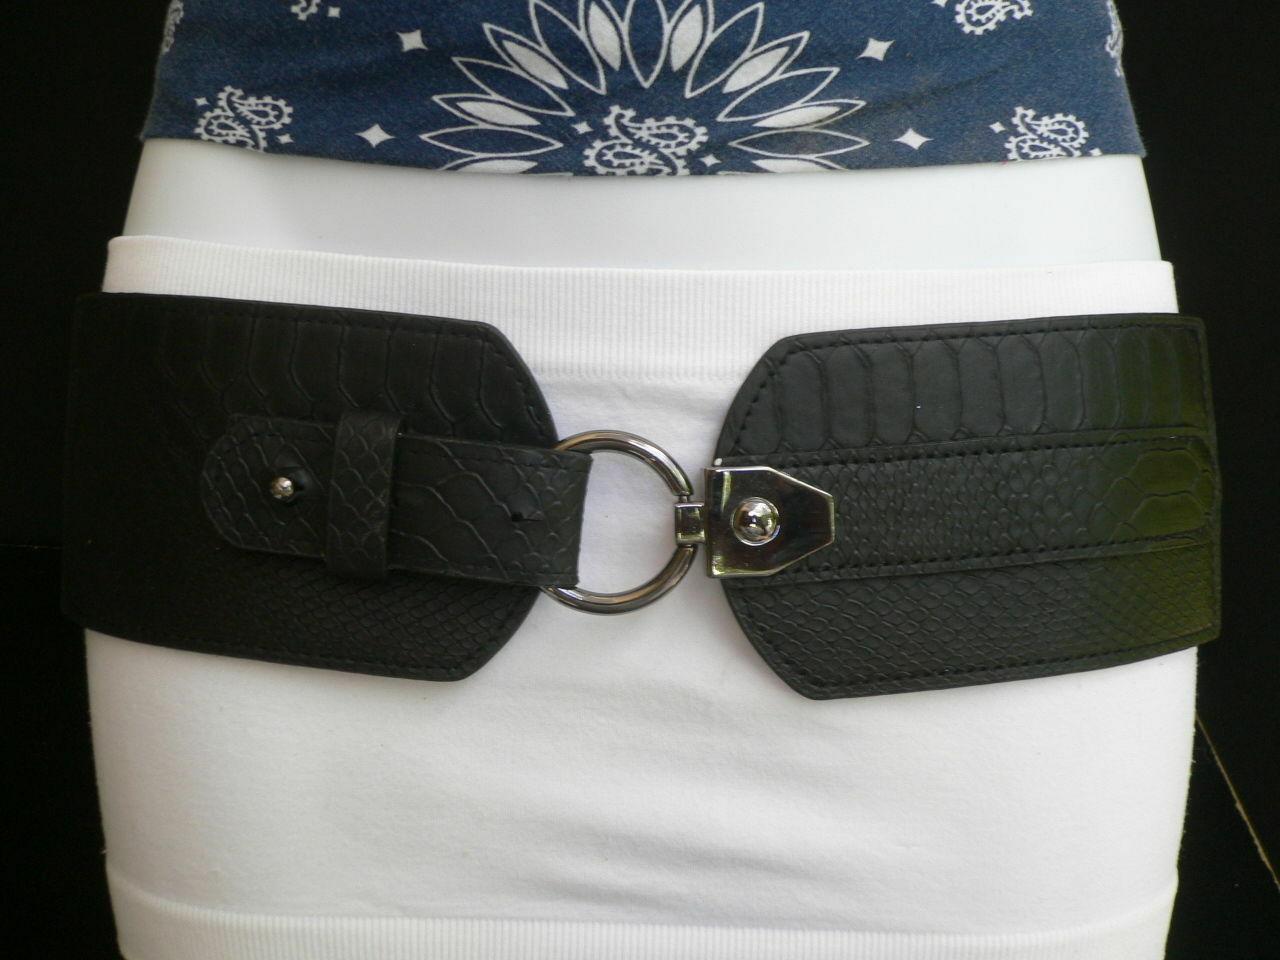 Cintura Donna Fashion Hip Vita Elastico Nero Largo Finta pelle Serpente Timbro image 6